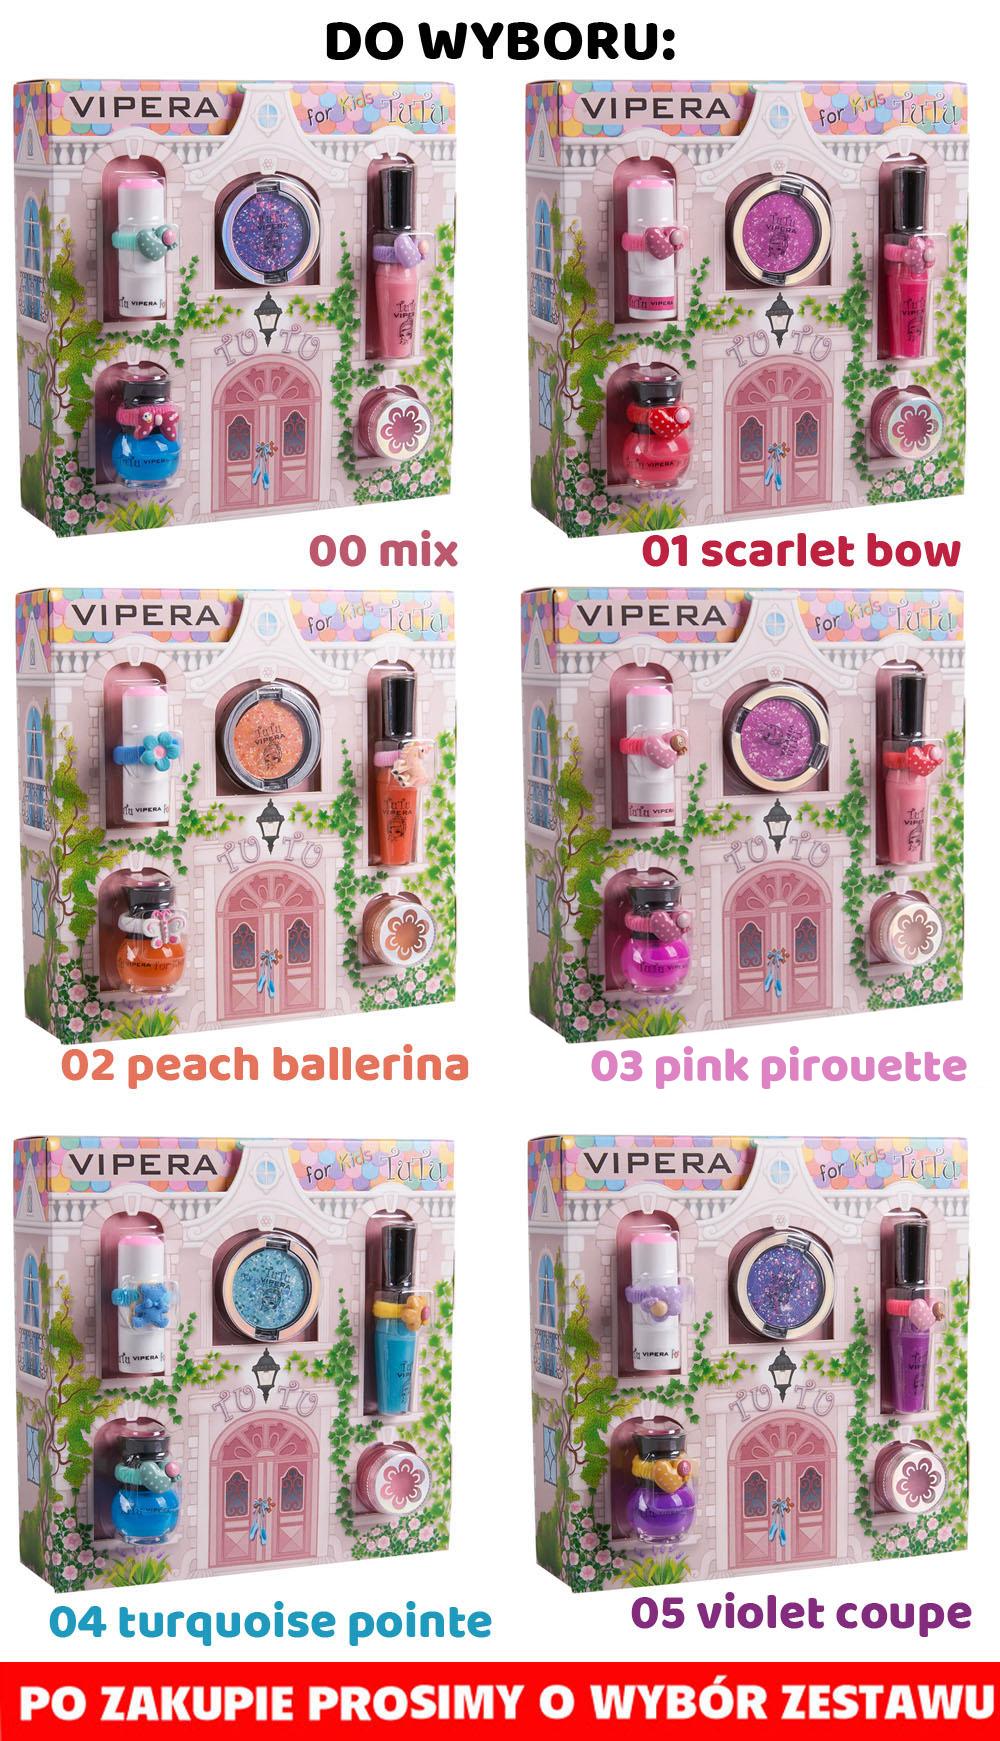 Cosmetics VIPERA TuTu for girls Cottage KO0003 | cosmetics for